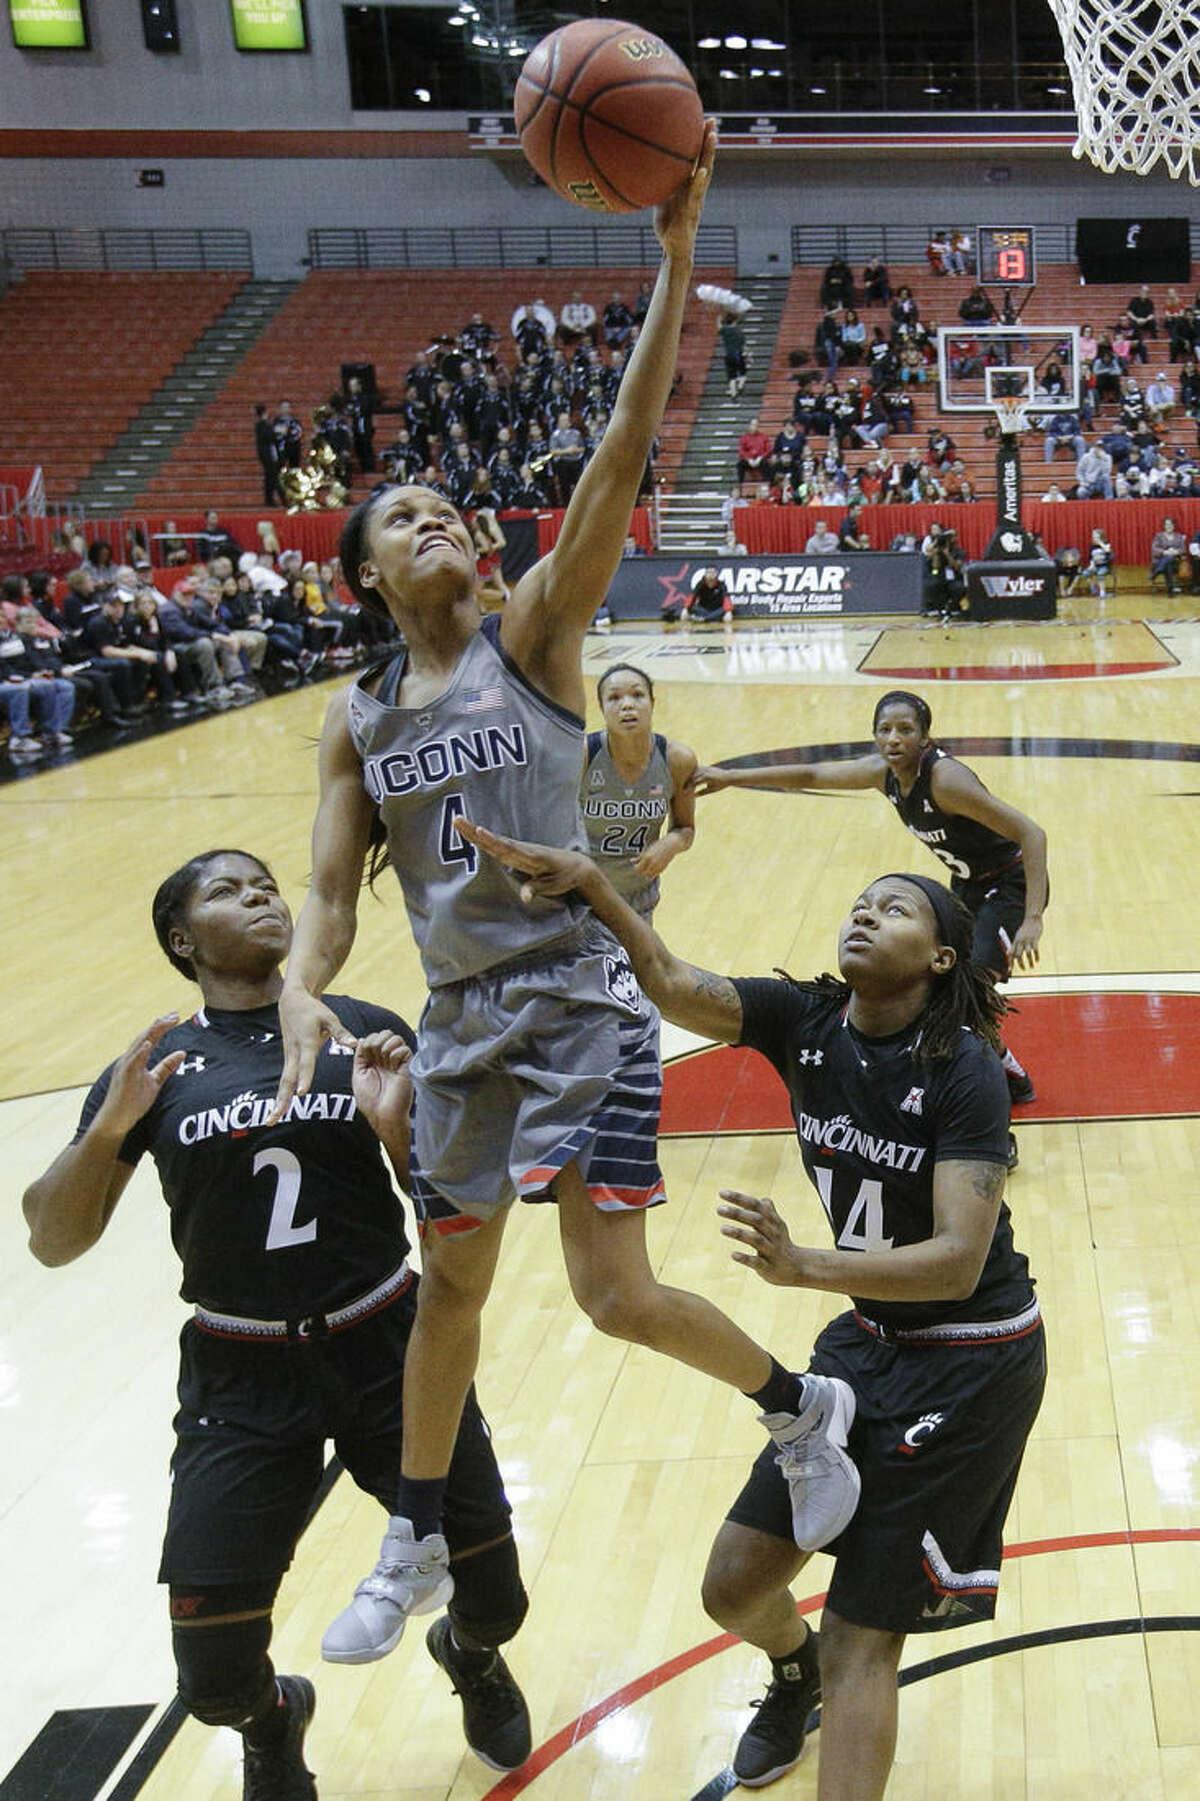 Connecticut's Moriah Jefferson (4) shoots over Cincinnati's Nikira Goings (2) and Trinity Hunter (14) during the first half of an NCAA college basketball game, Wednesday, Dec. 30, 2015, in Cincinnati. (AP Photo/John Minchillo)